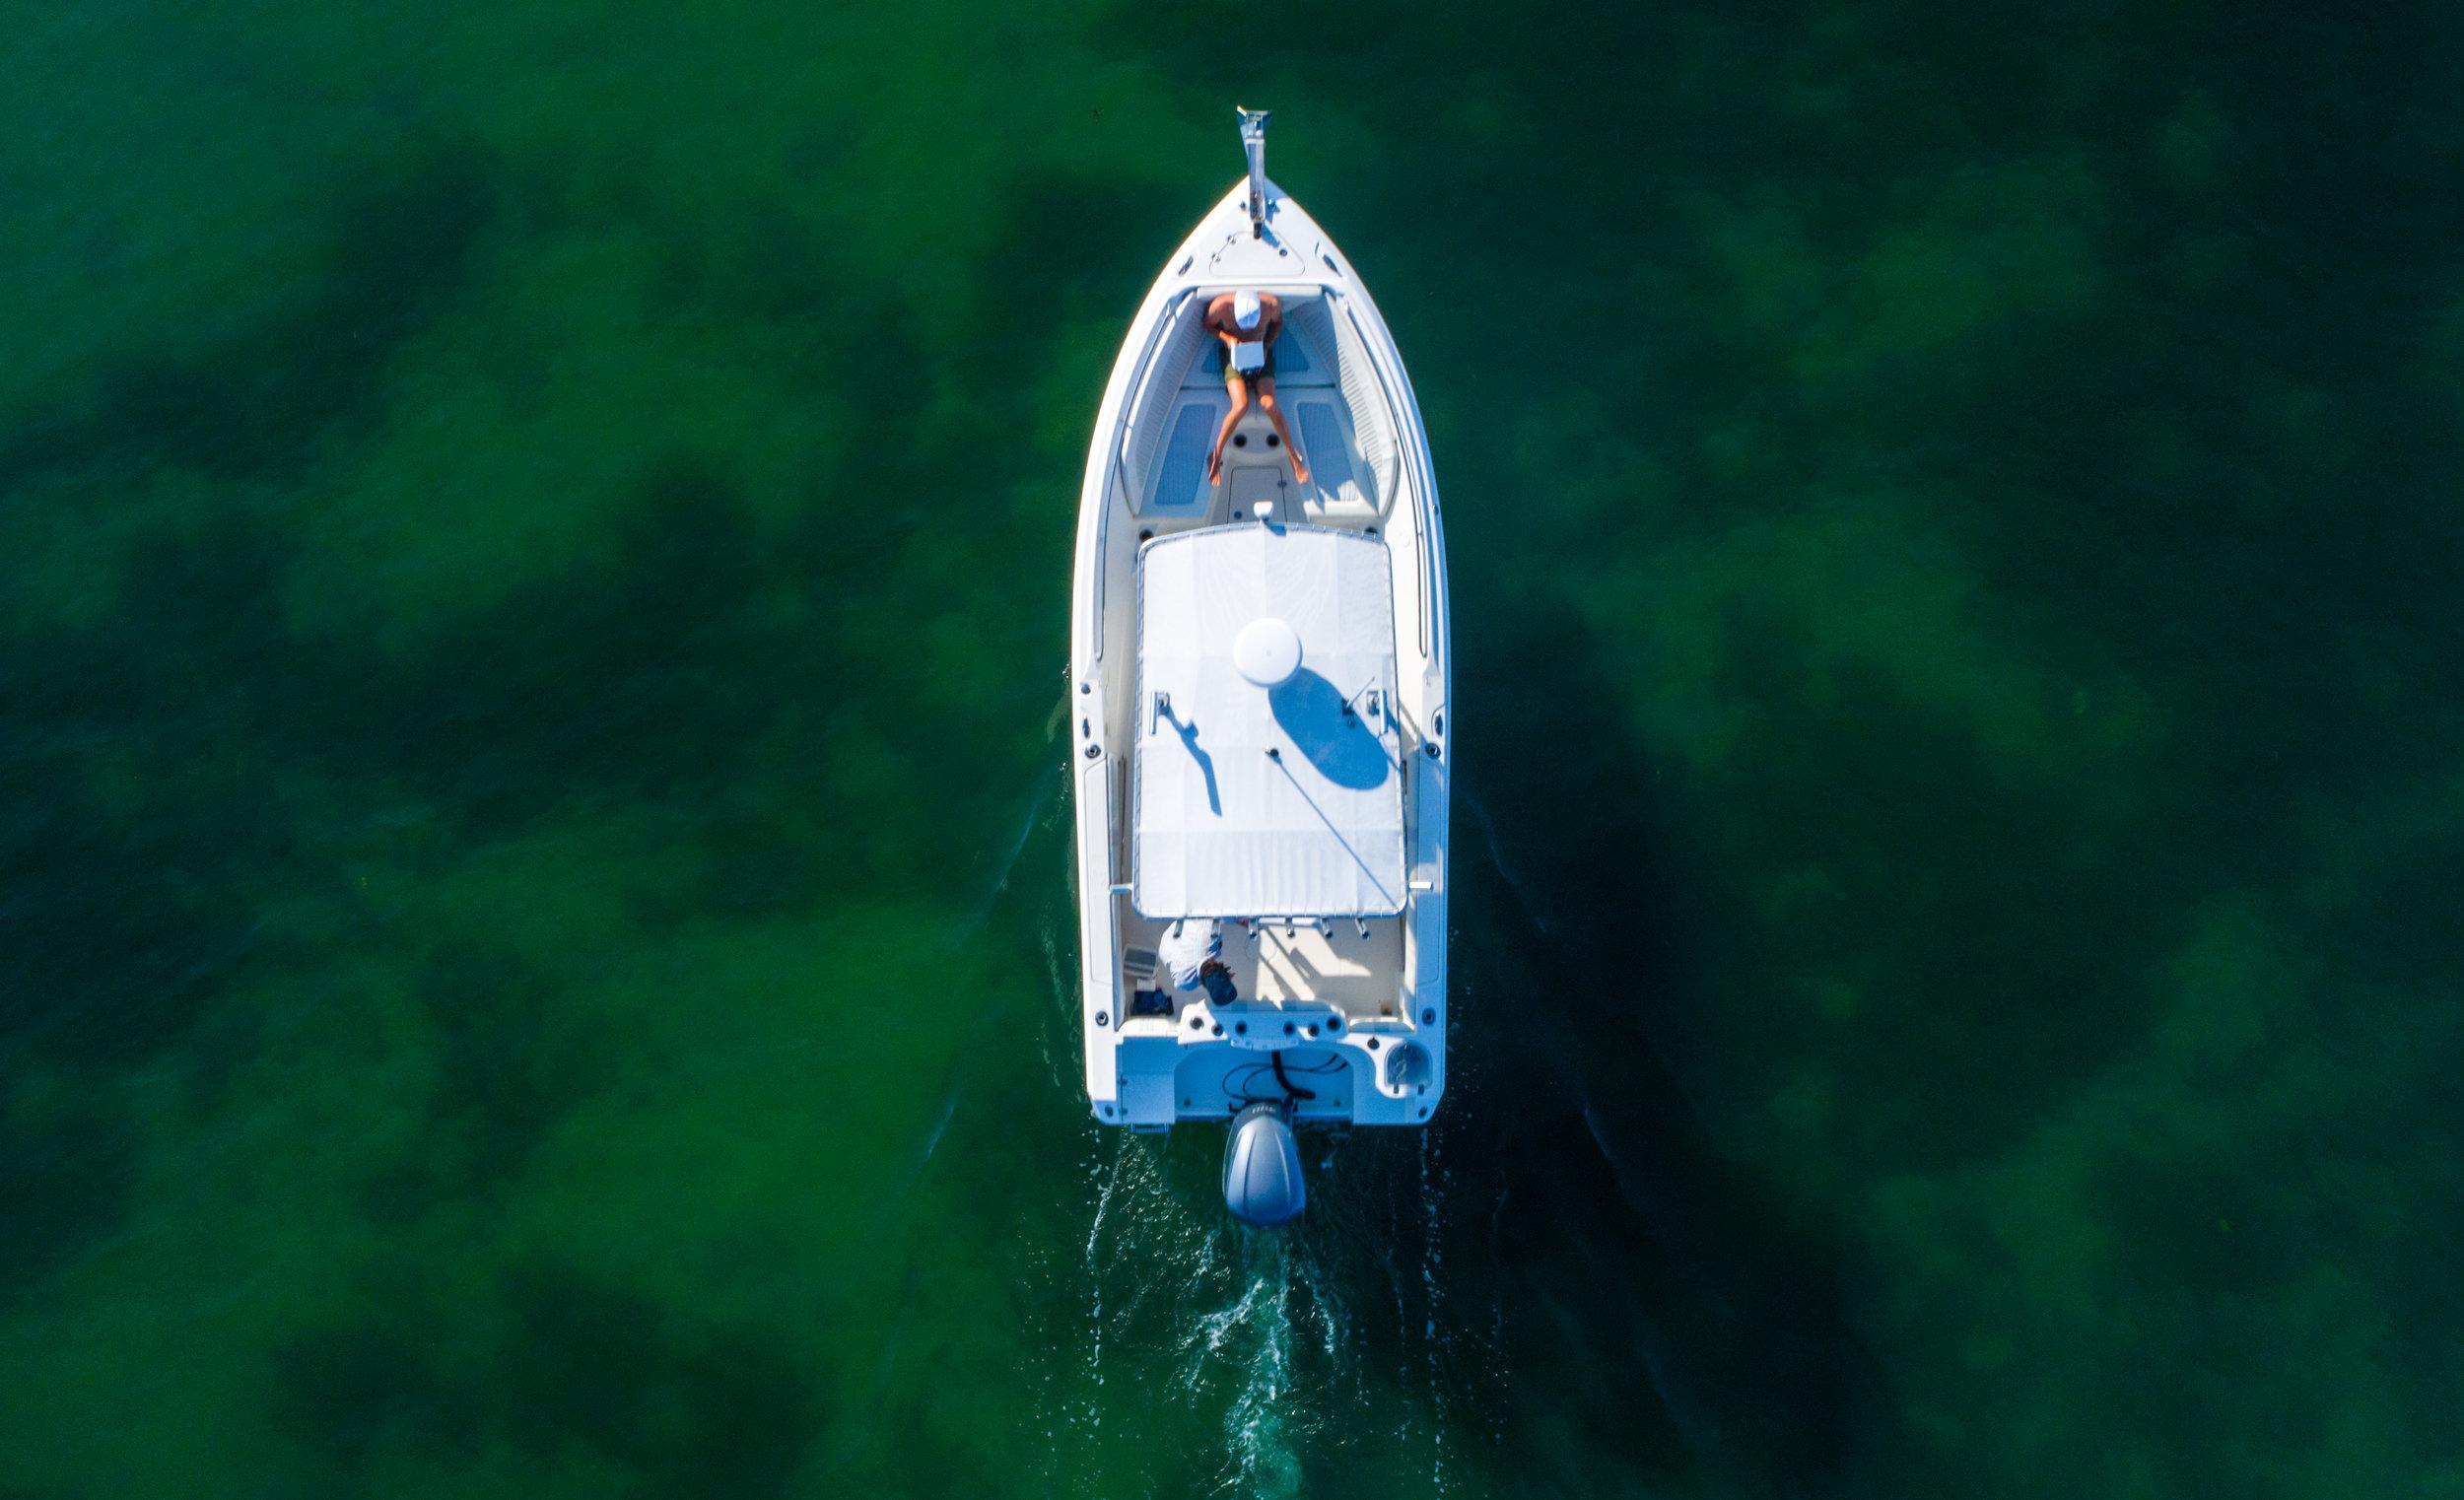 Boat_Photos-7.jpg